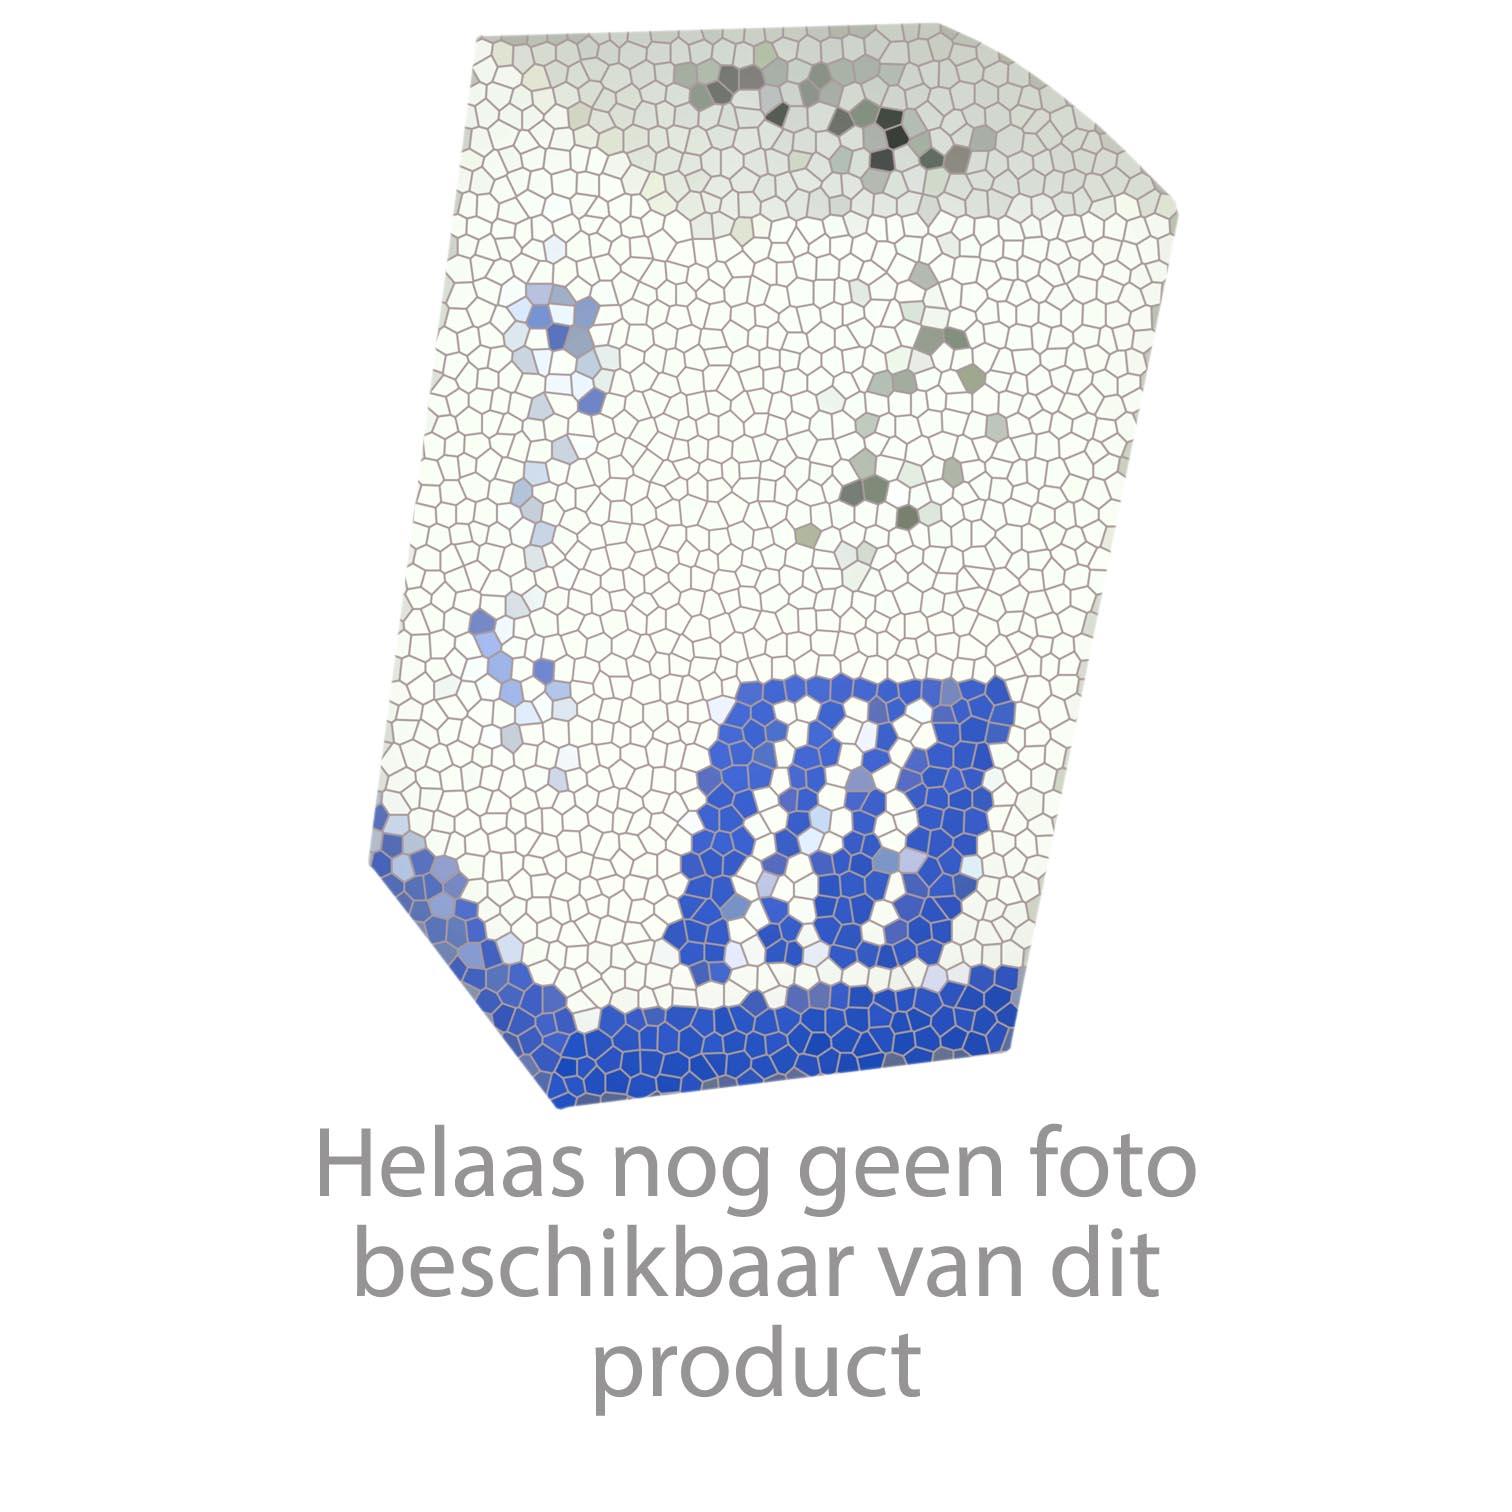 Kwc Onderdelen Ono Keukenkraan 1-Greeps Met Semipro Spoeldouche Artikelnummer 10.151.423.000Fl